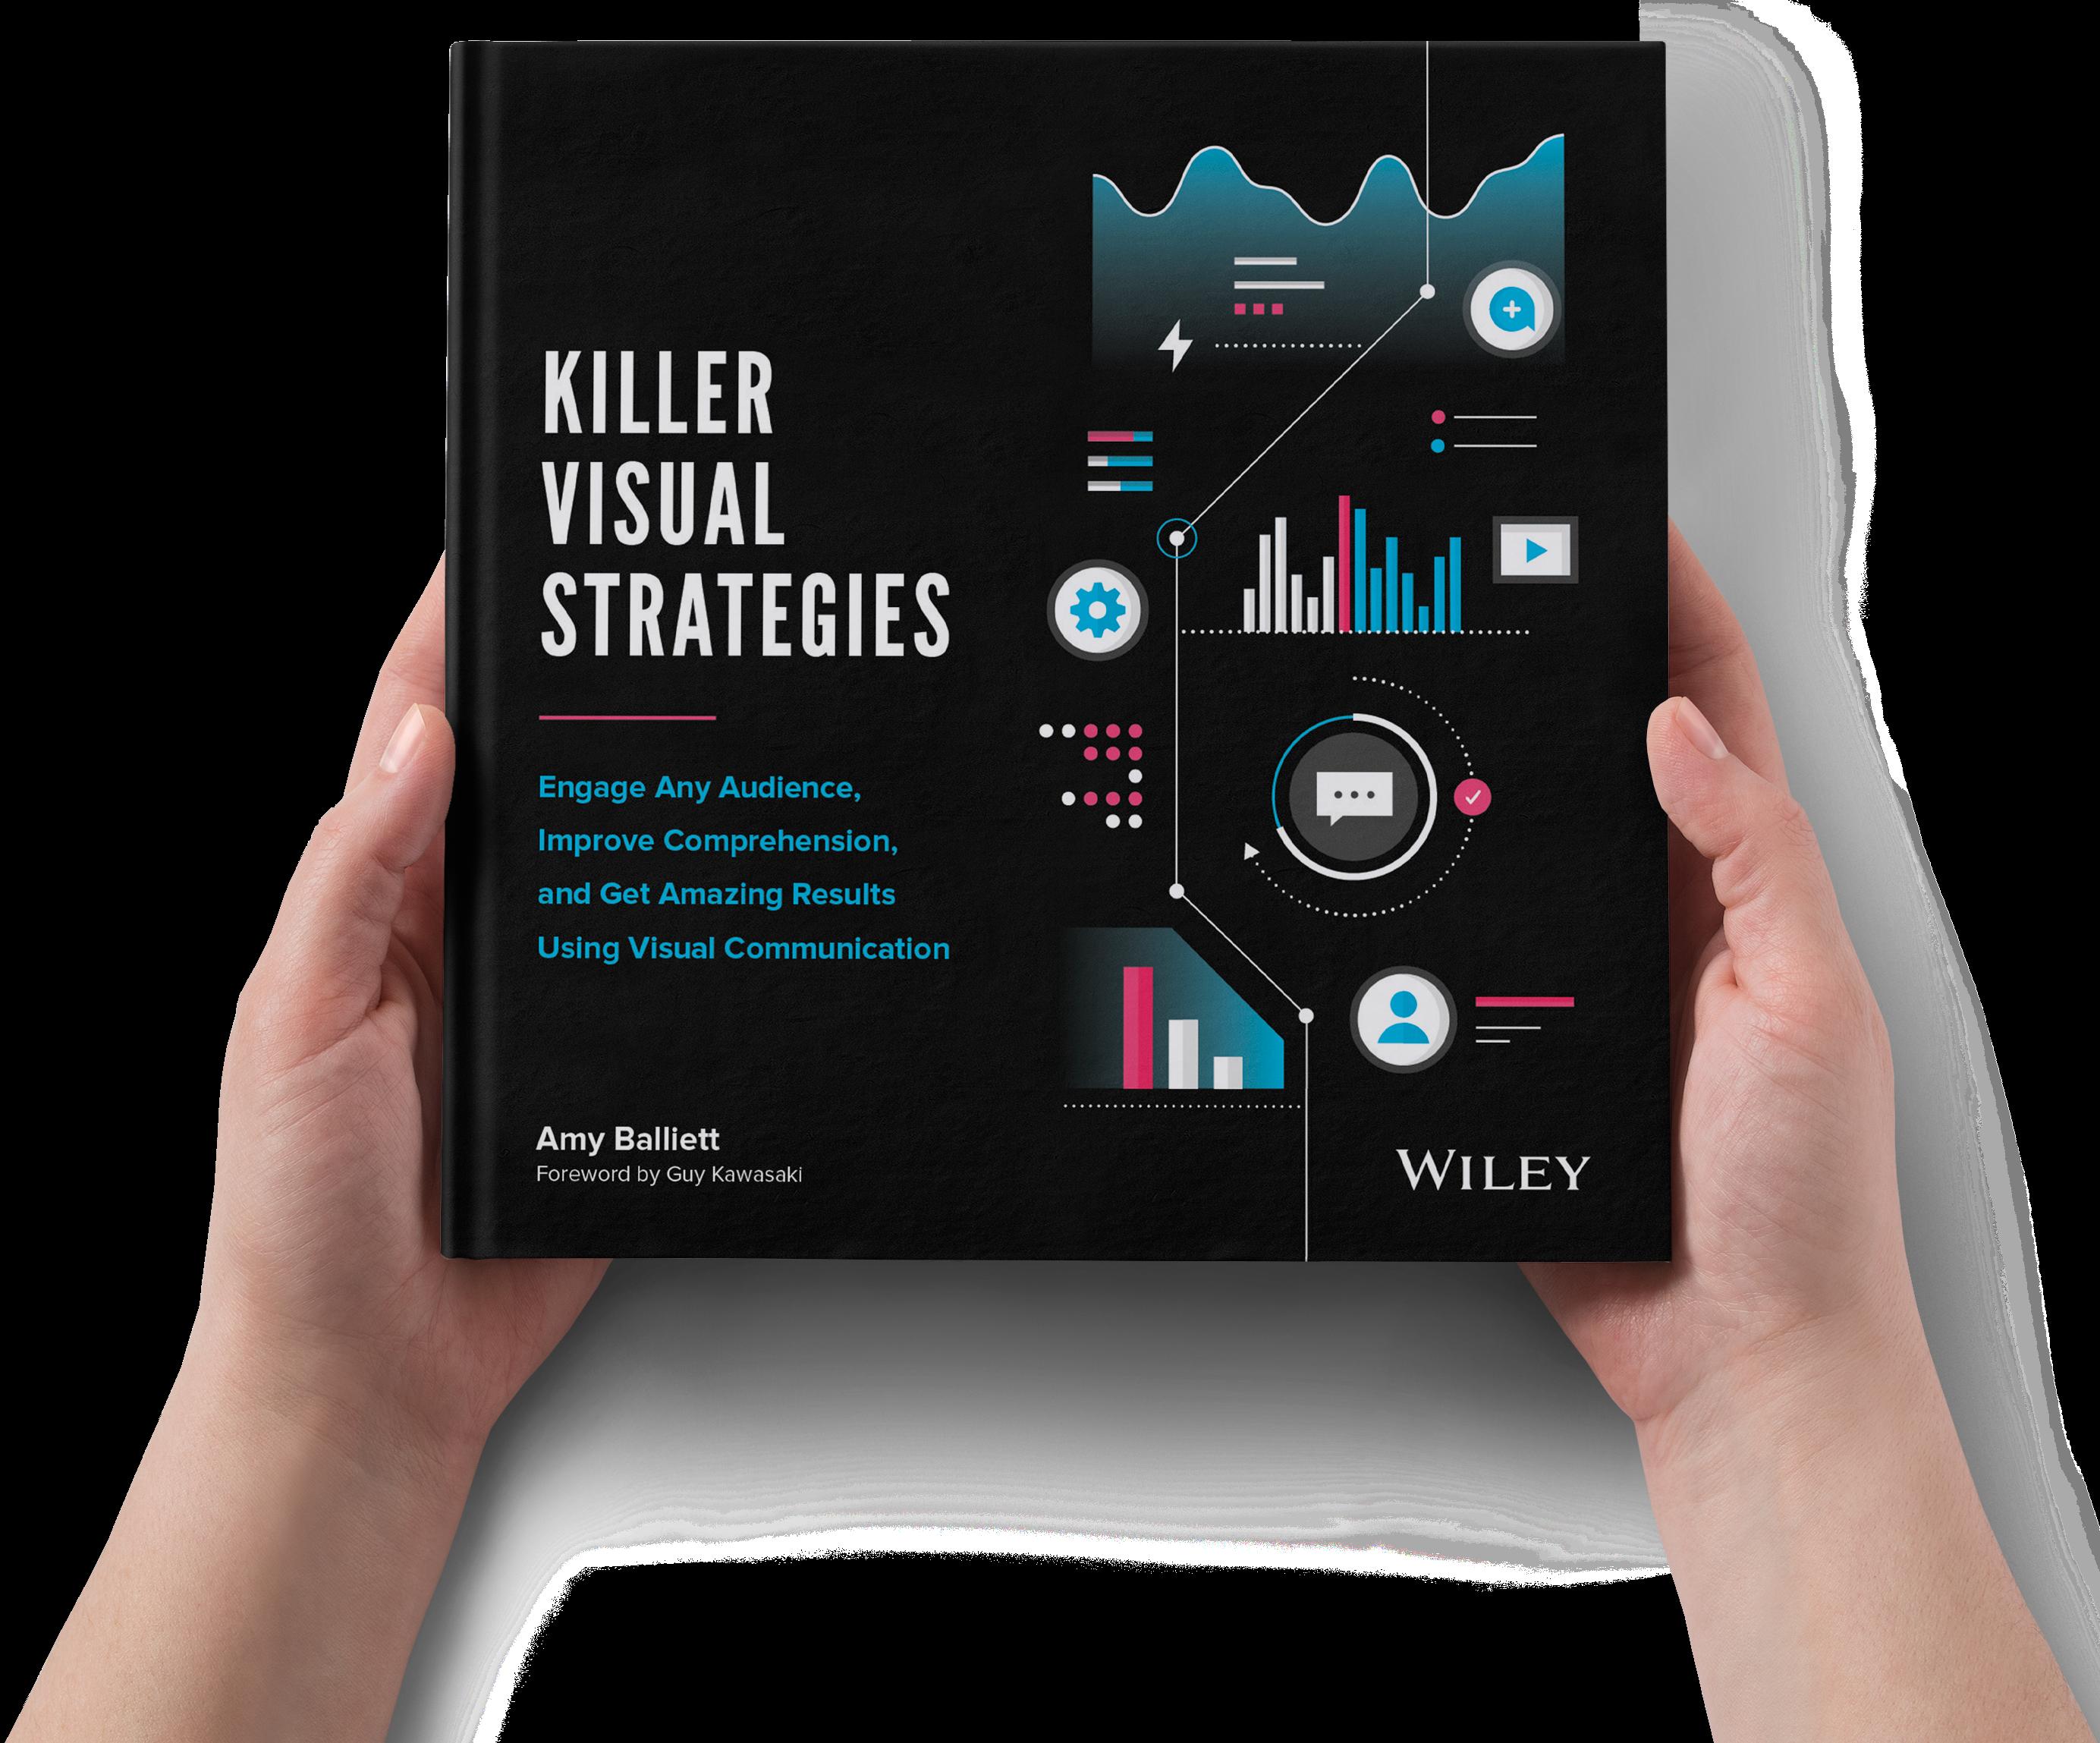 Hands holding Killer Visual Strategies, a book by Amy Balliett